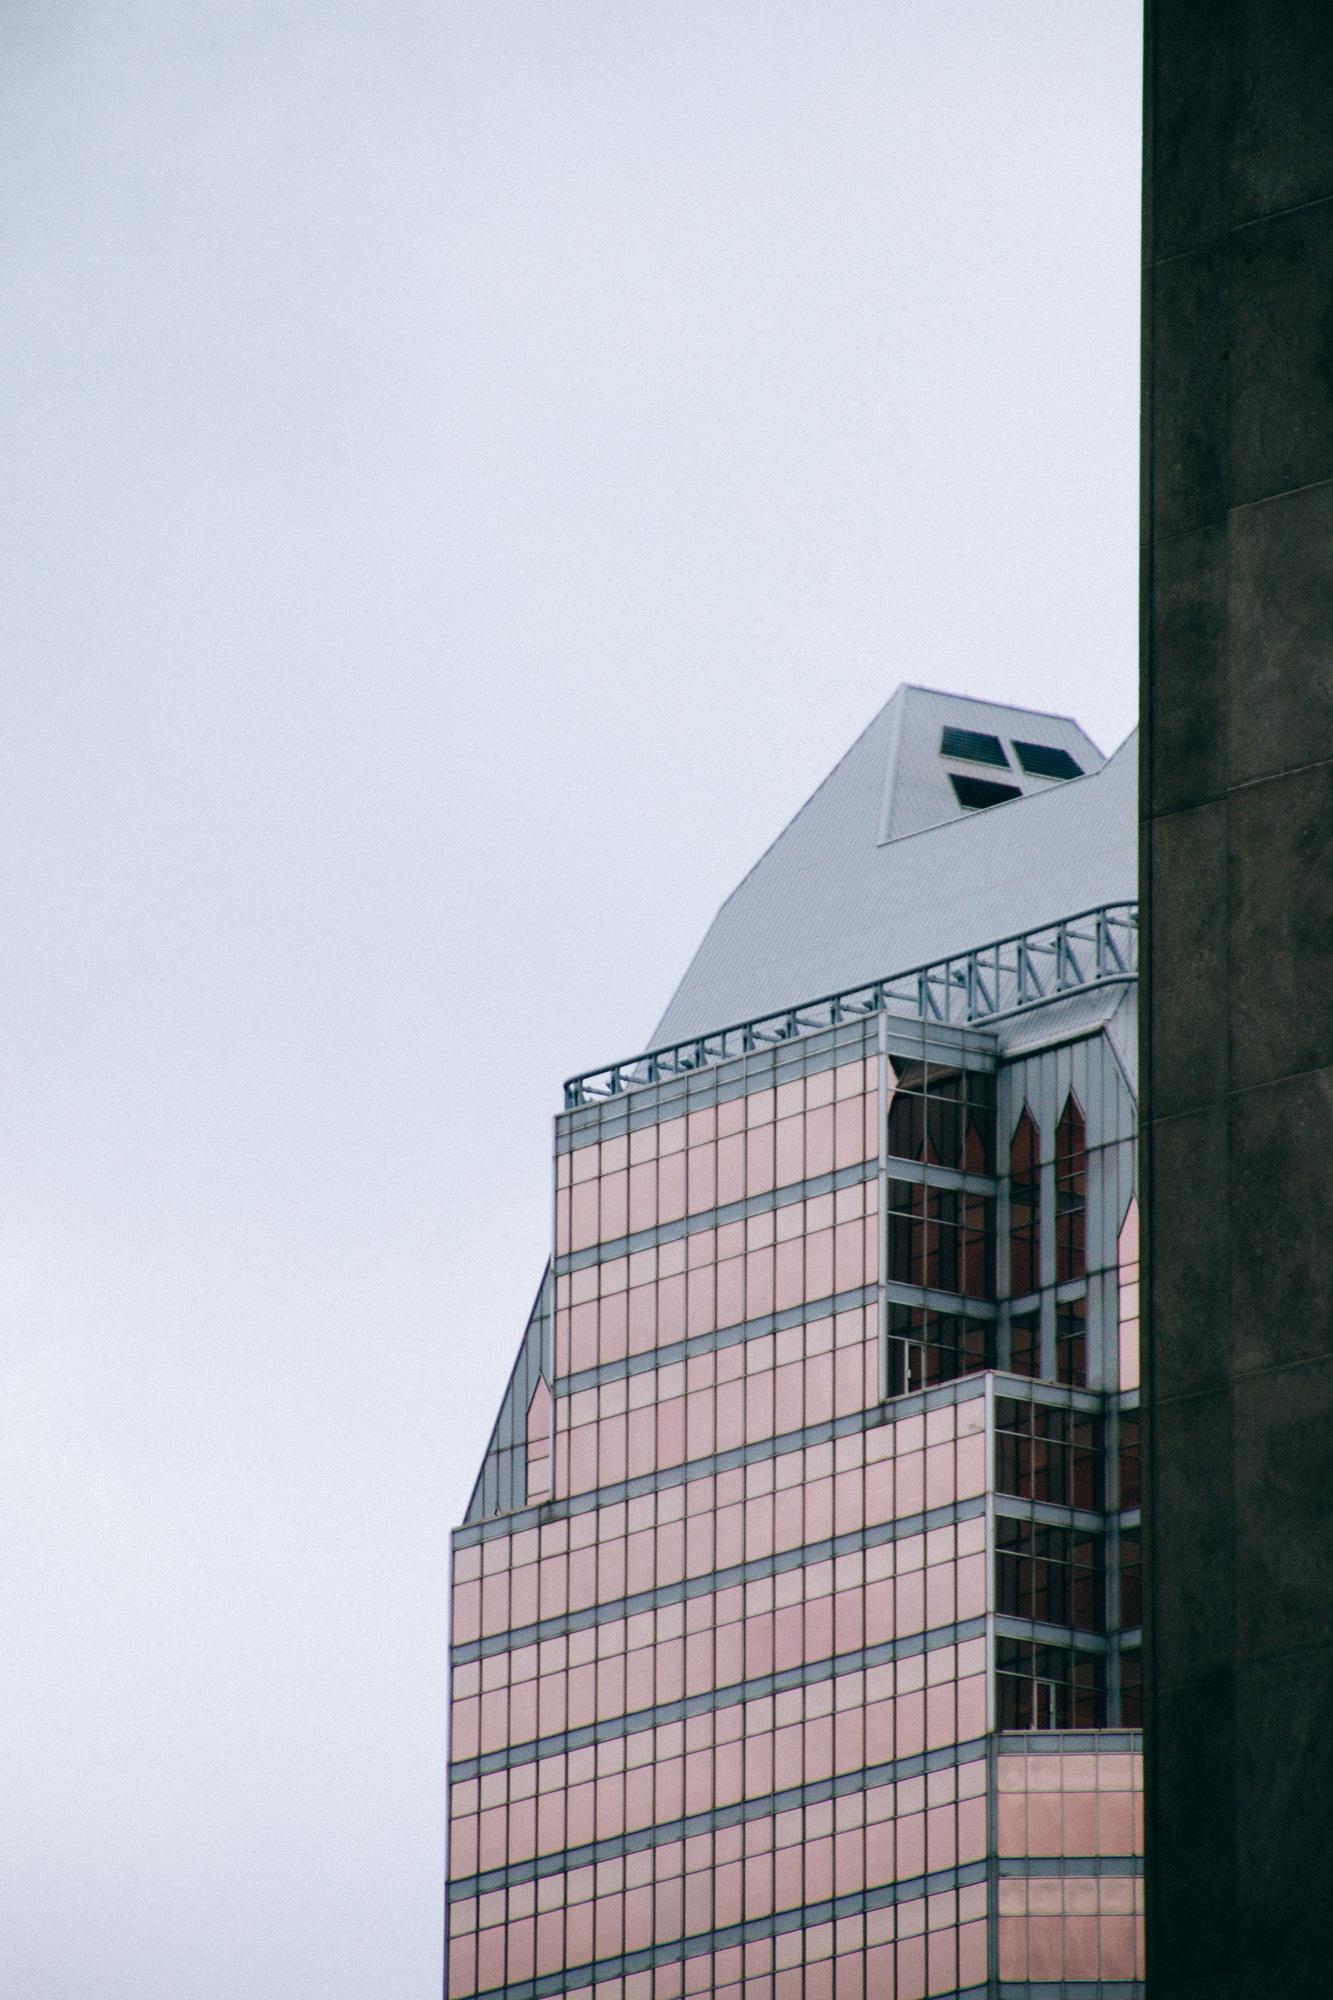 montreal-28.jpg